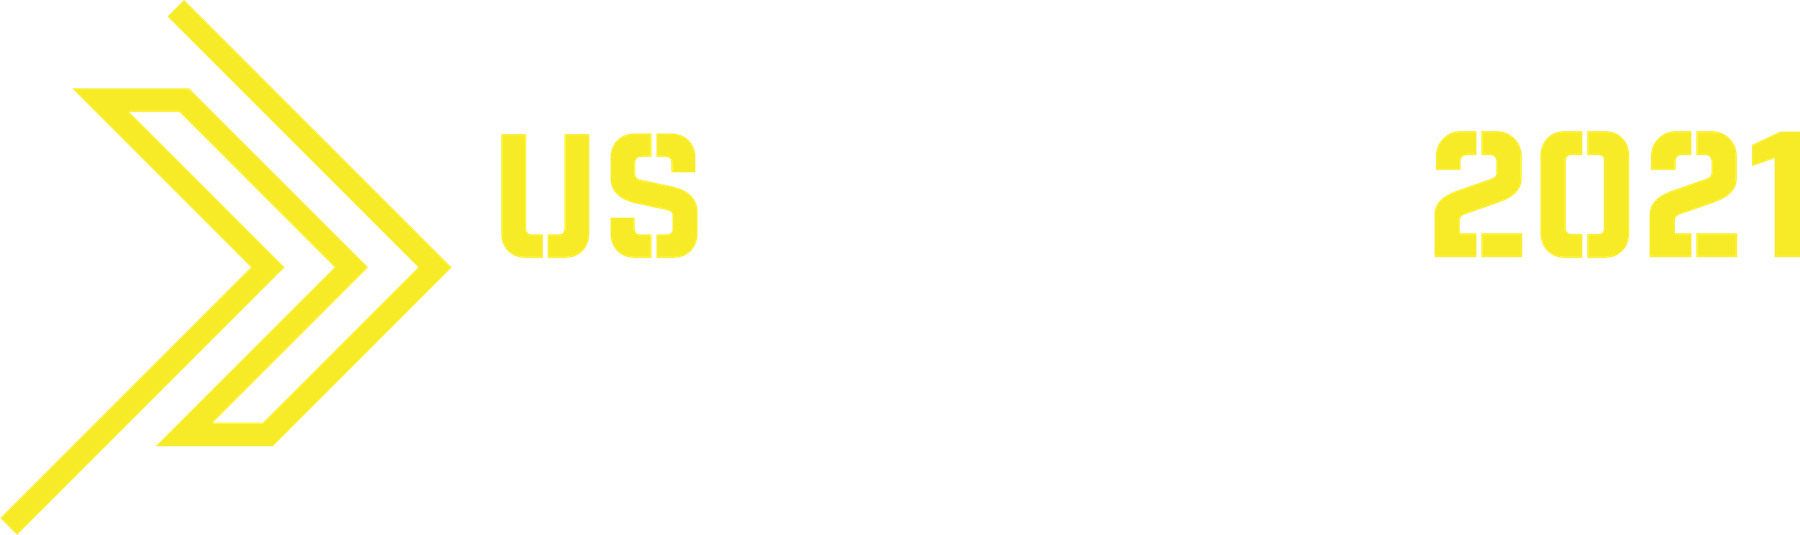 US Search Awards logo